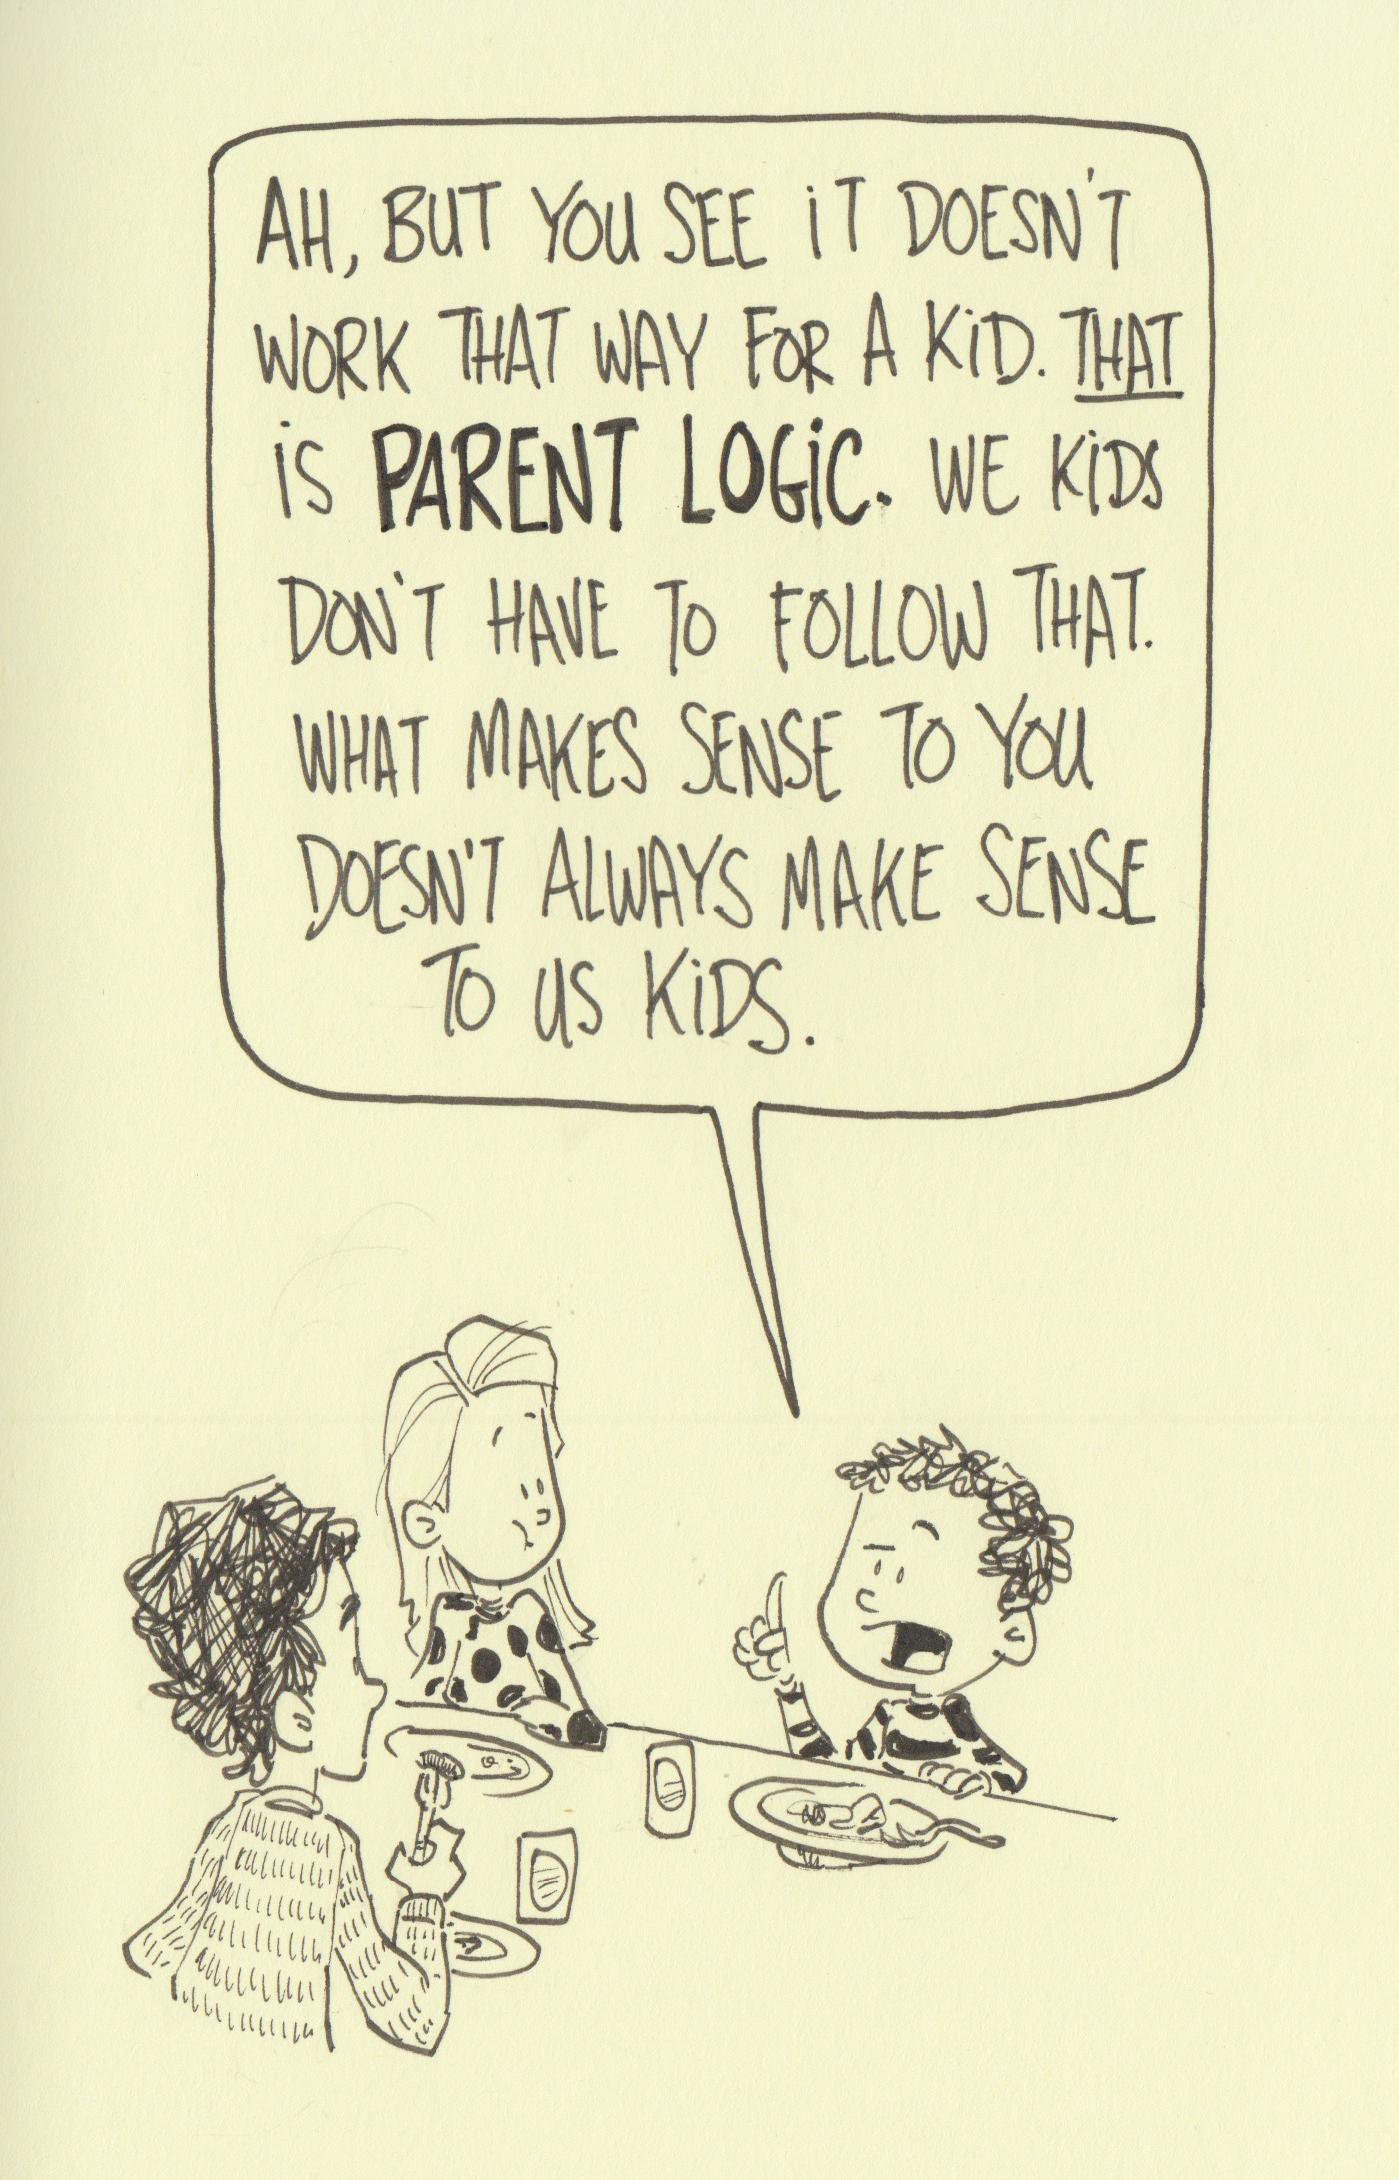 parent logic